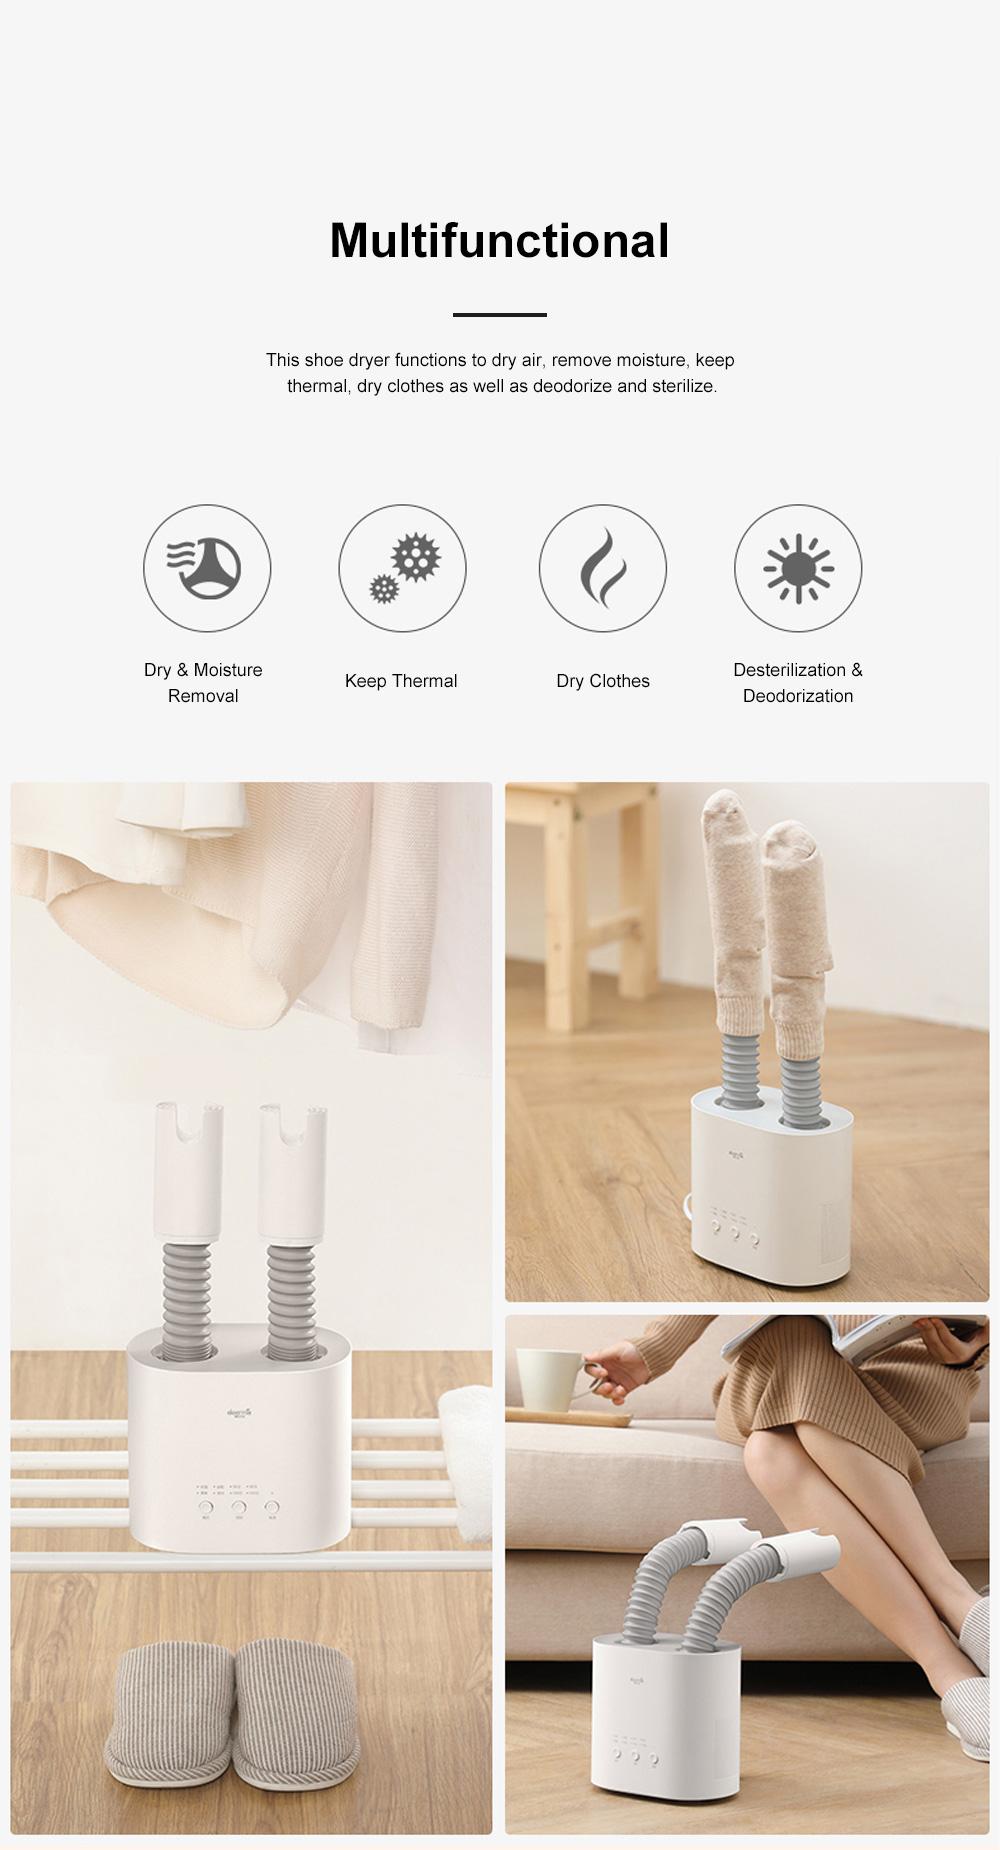 DEERMA Multiple-effect Shoe Dryer for Family Use Deodorizing and Sterilizing Drying Machine Multifunctional Telescopic Shoe Dryer 2